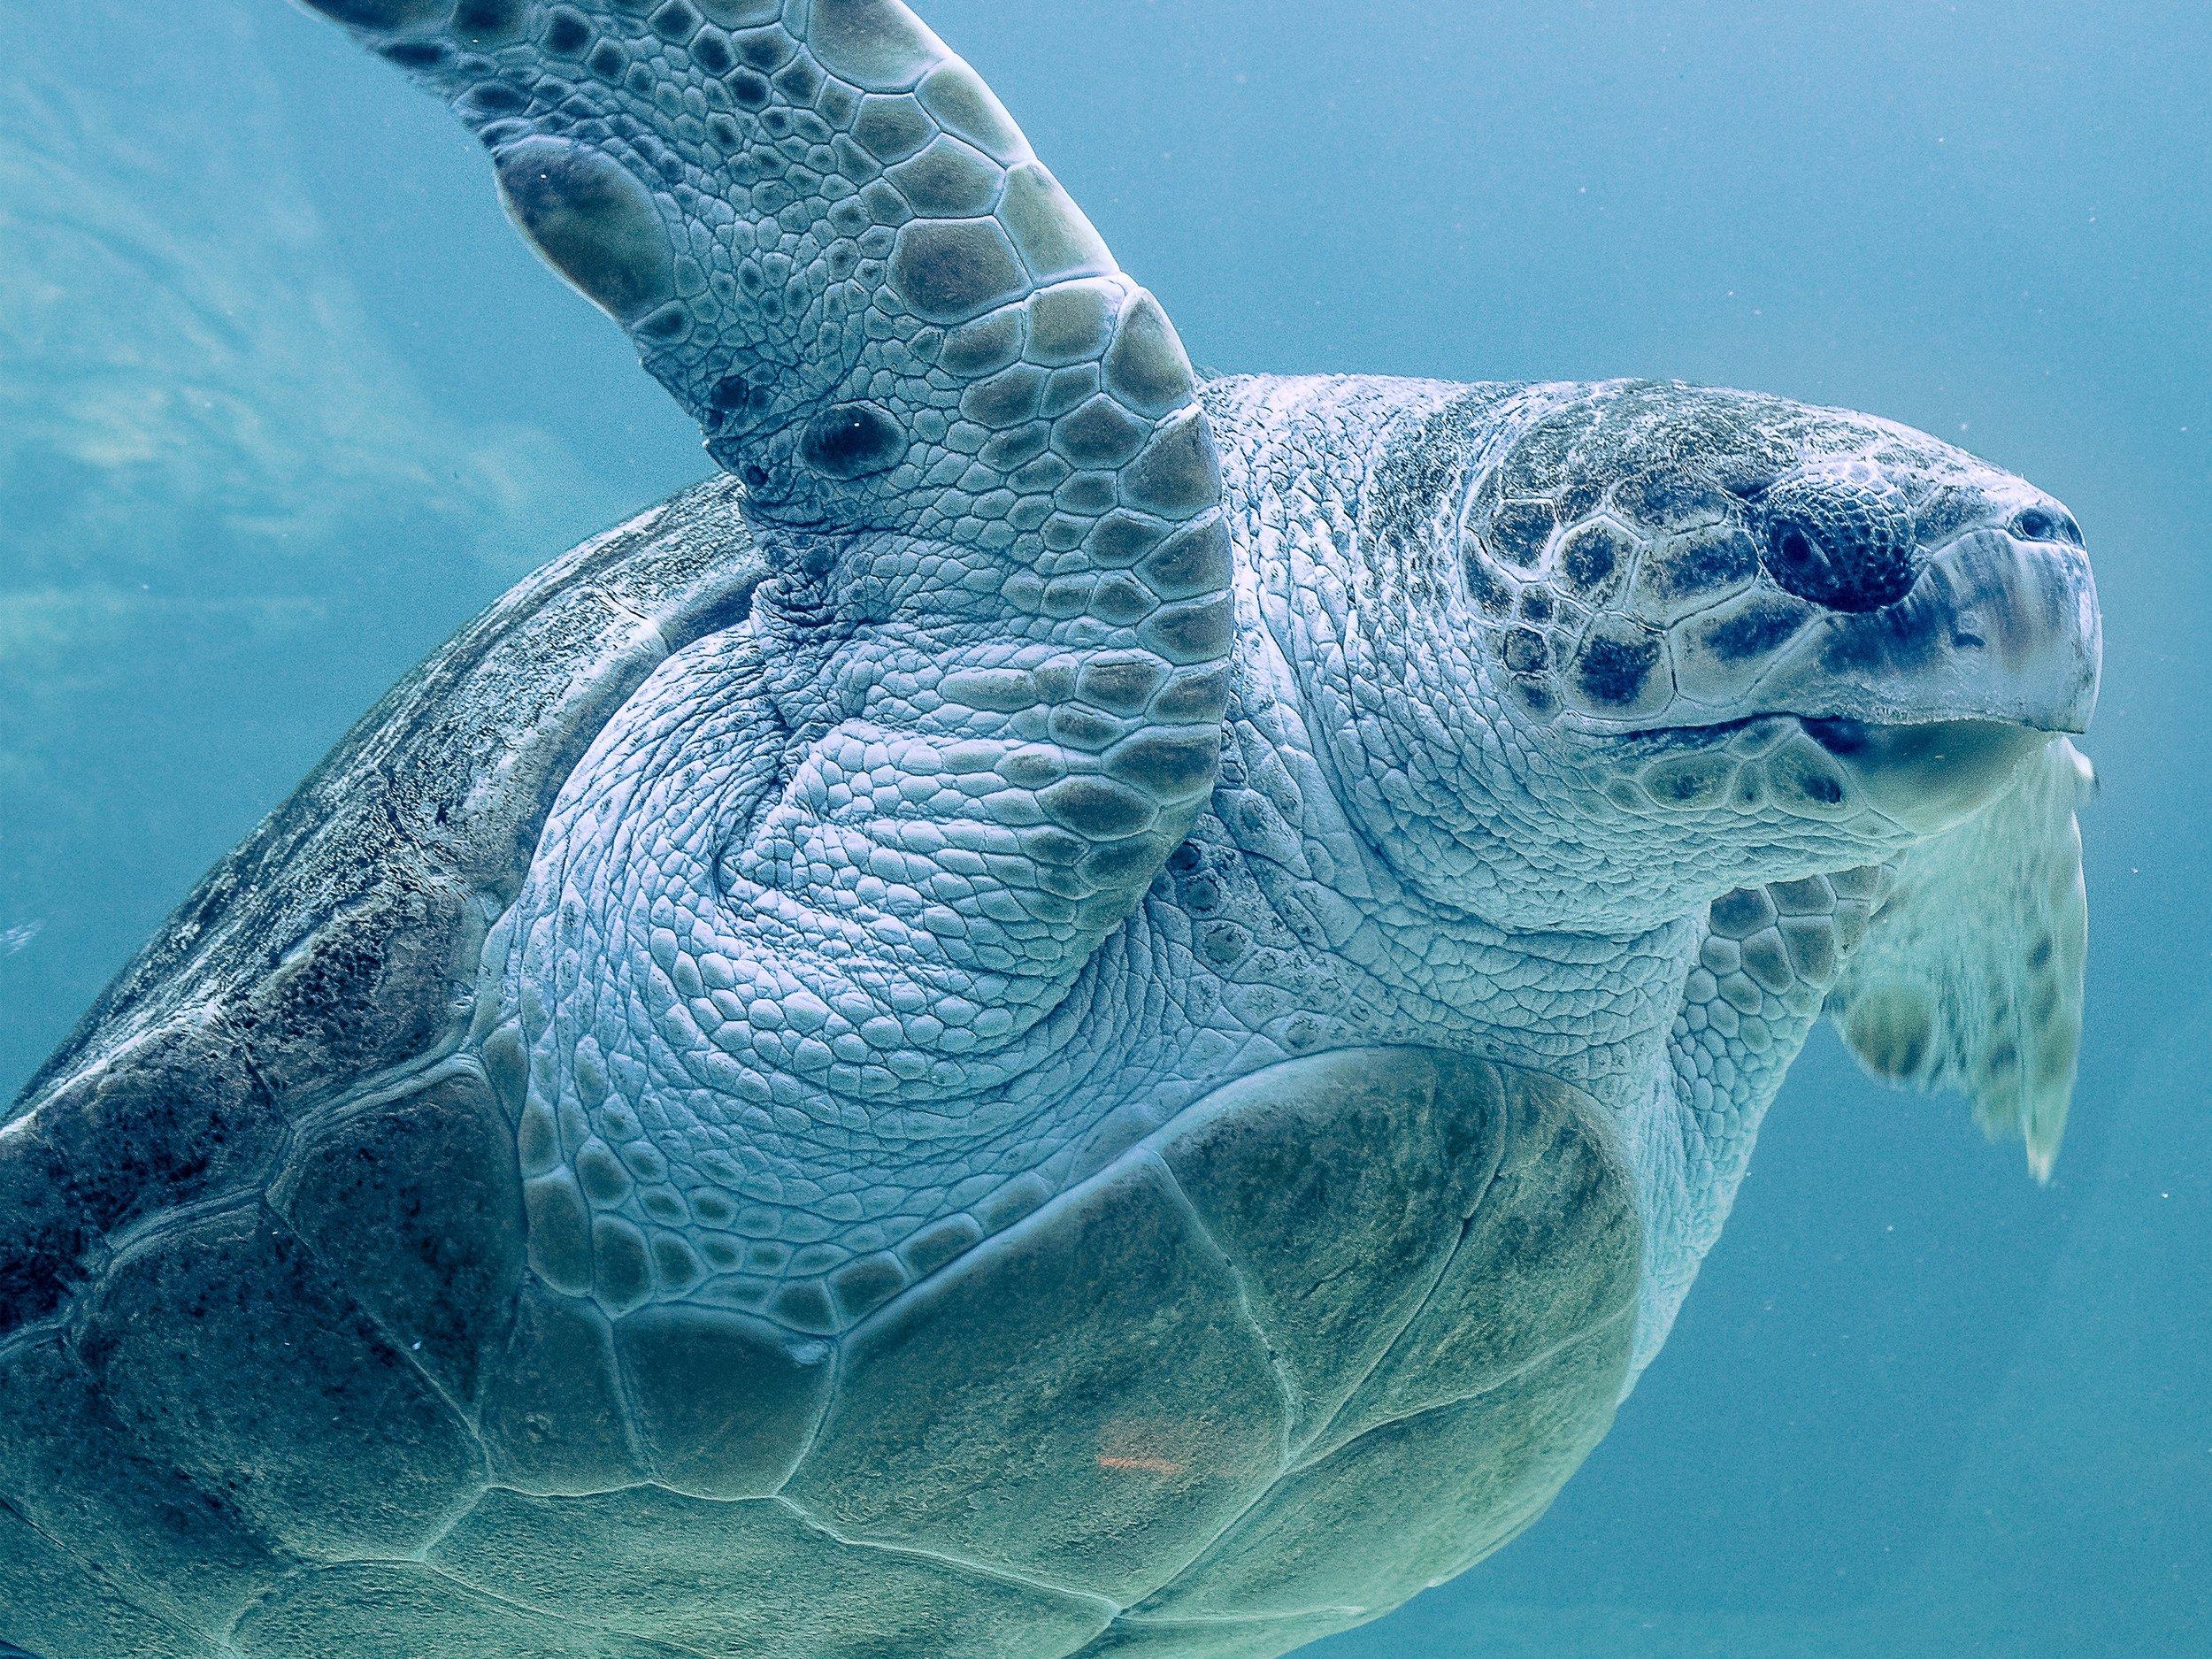 SEa turtle conservancy - Explorer, Photographer & Videographer